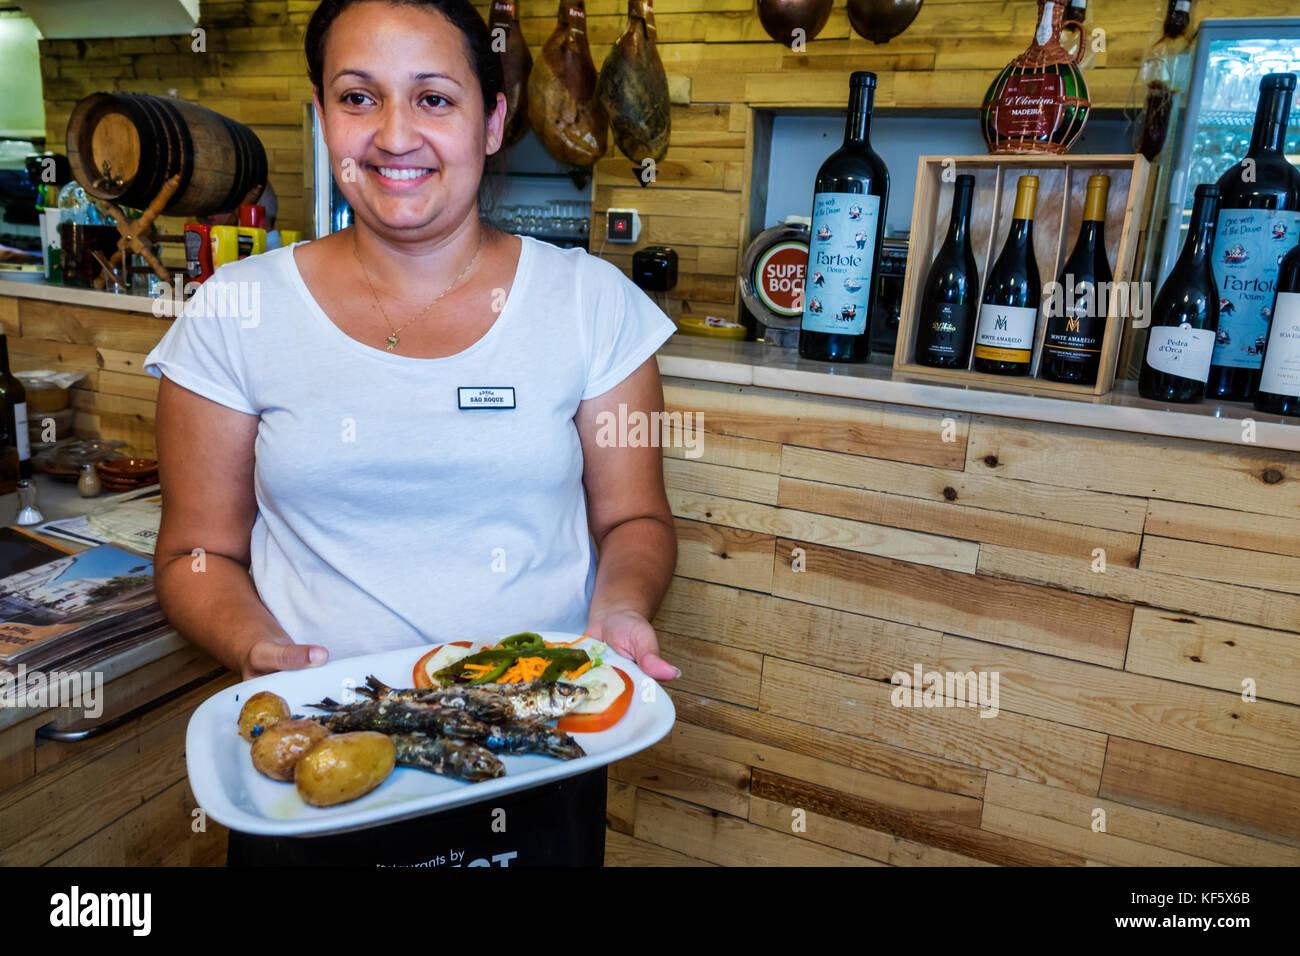 Lisbon Portugal Bairro Alto Restaurante Adega de Sao Roque restaurant dining Hispanic woman waitress carrying food - Stock Image